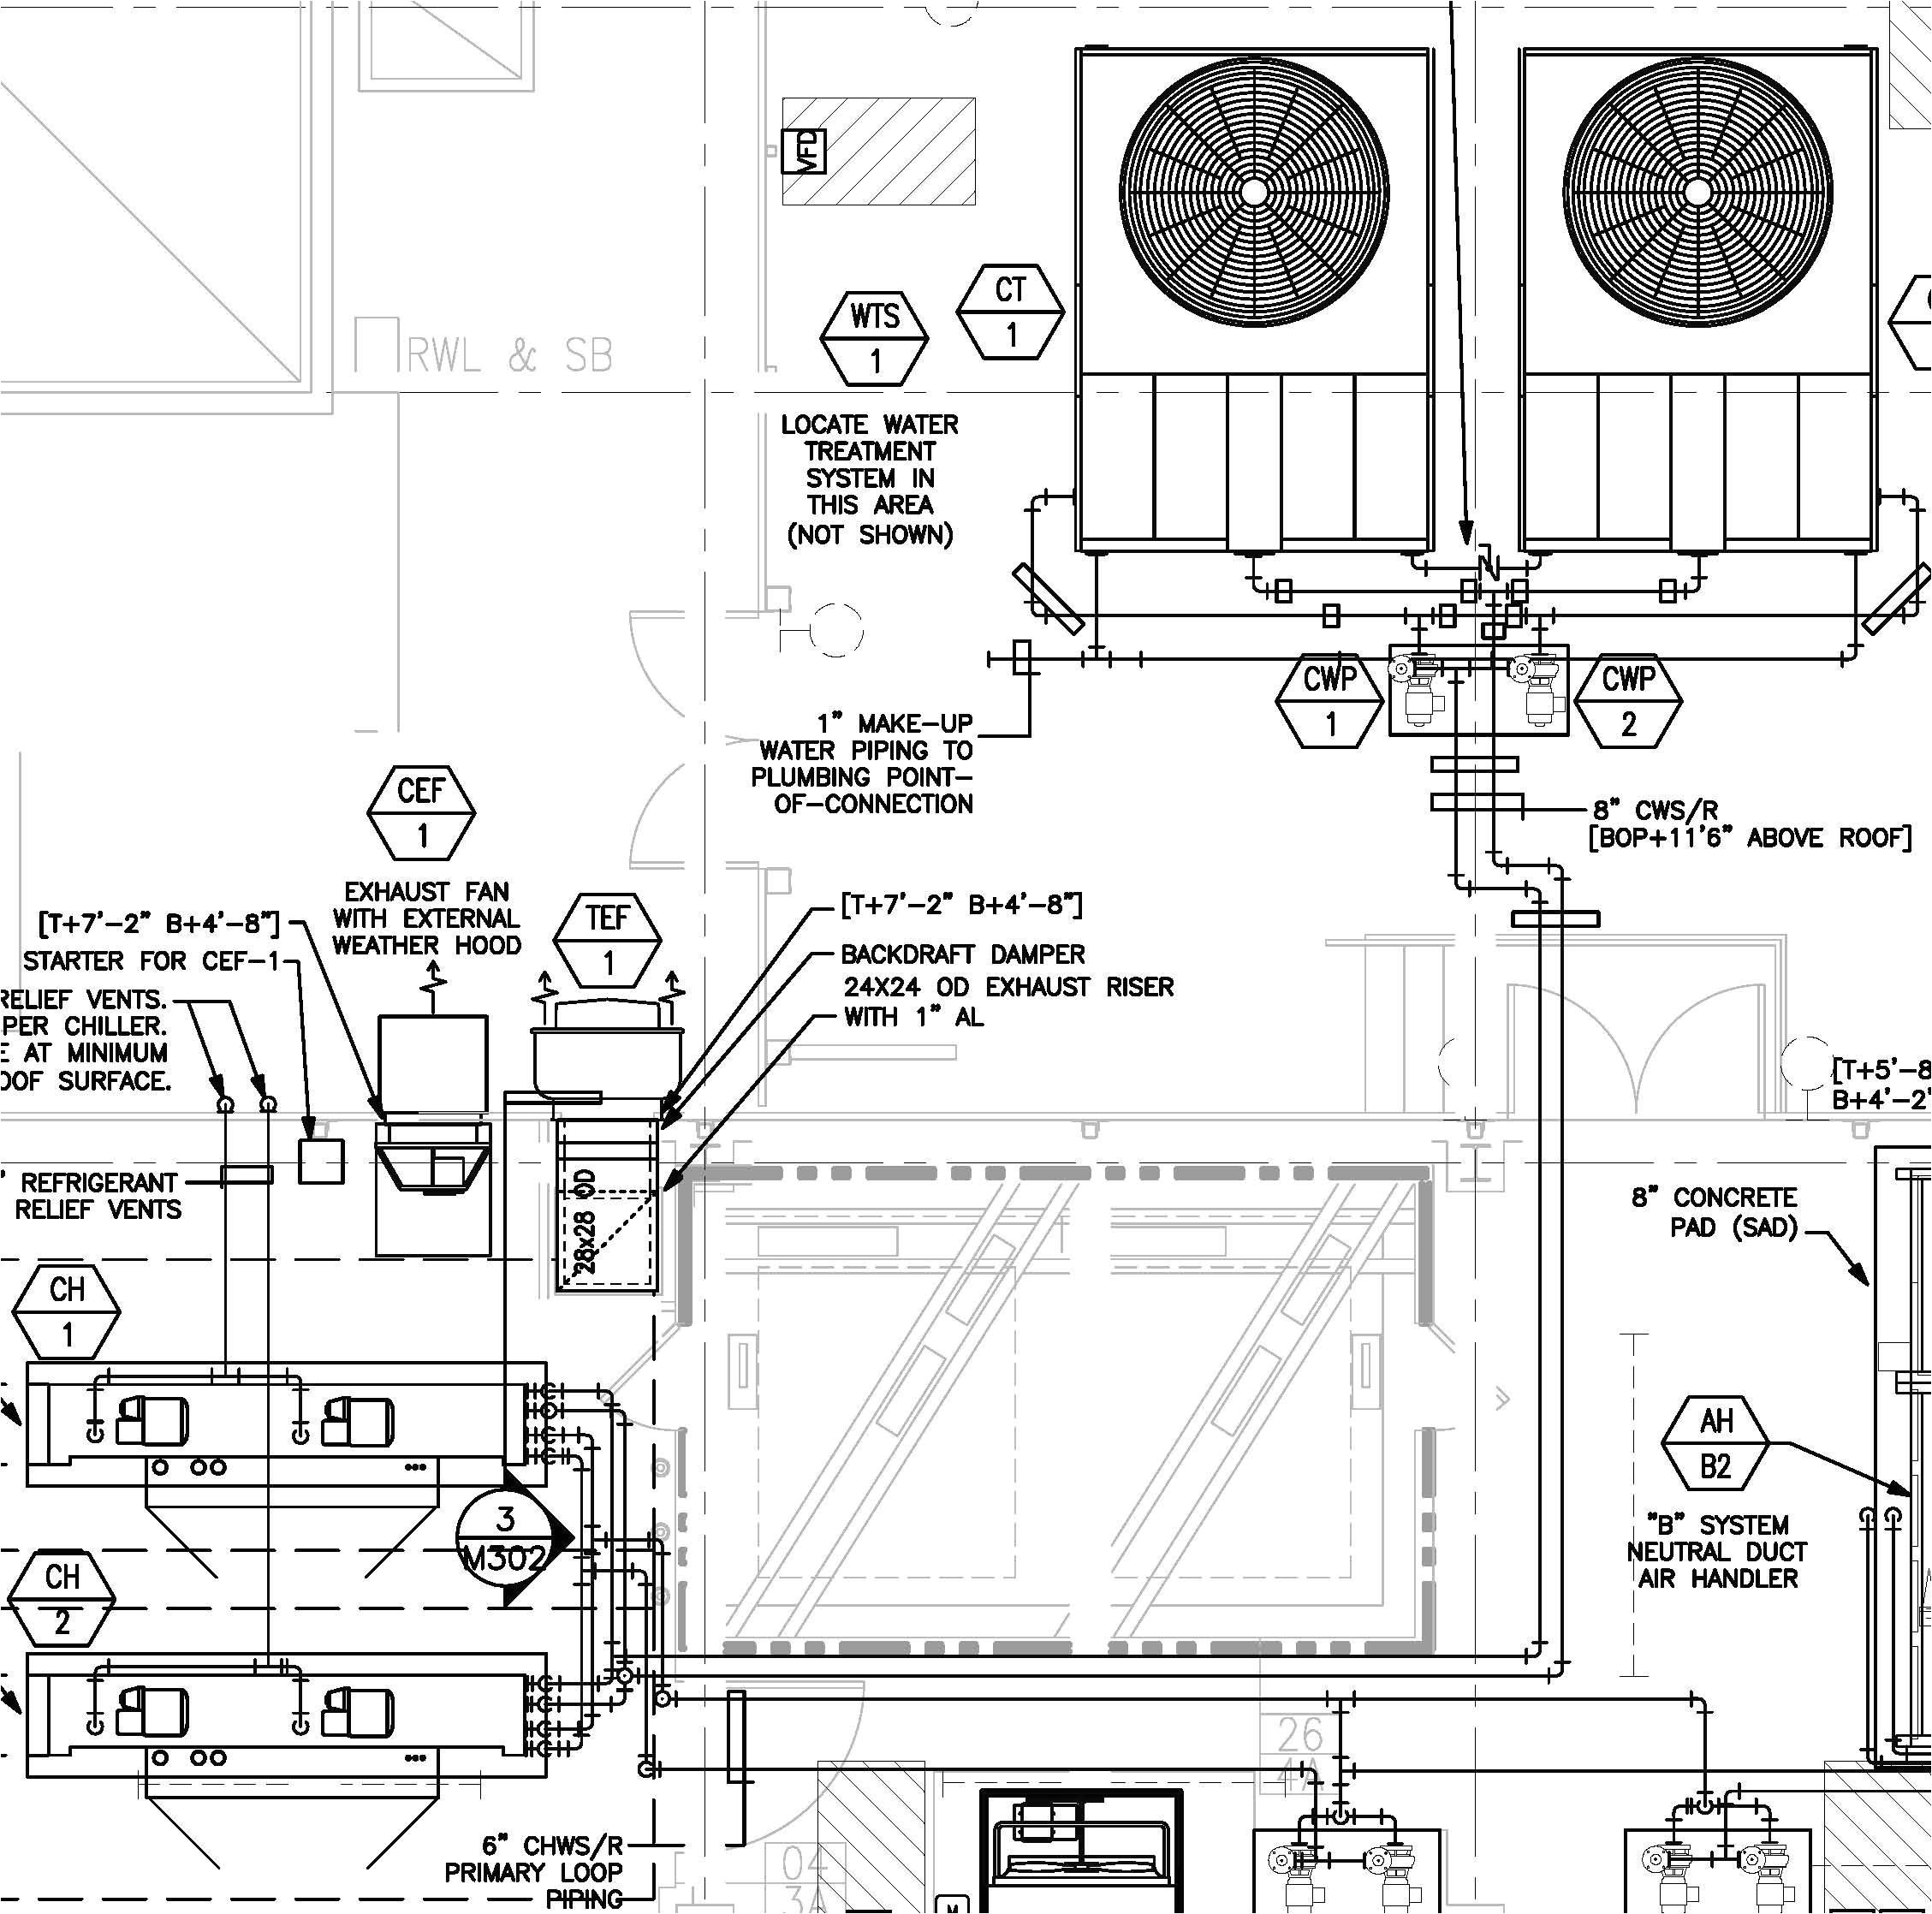 Auto Ac Wiring Diagram Diagram House Foundation Plans S Le Air Conditioning Unit Diagram